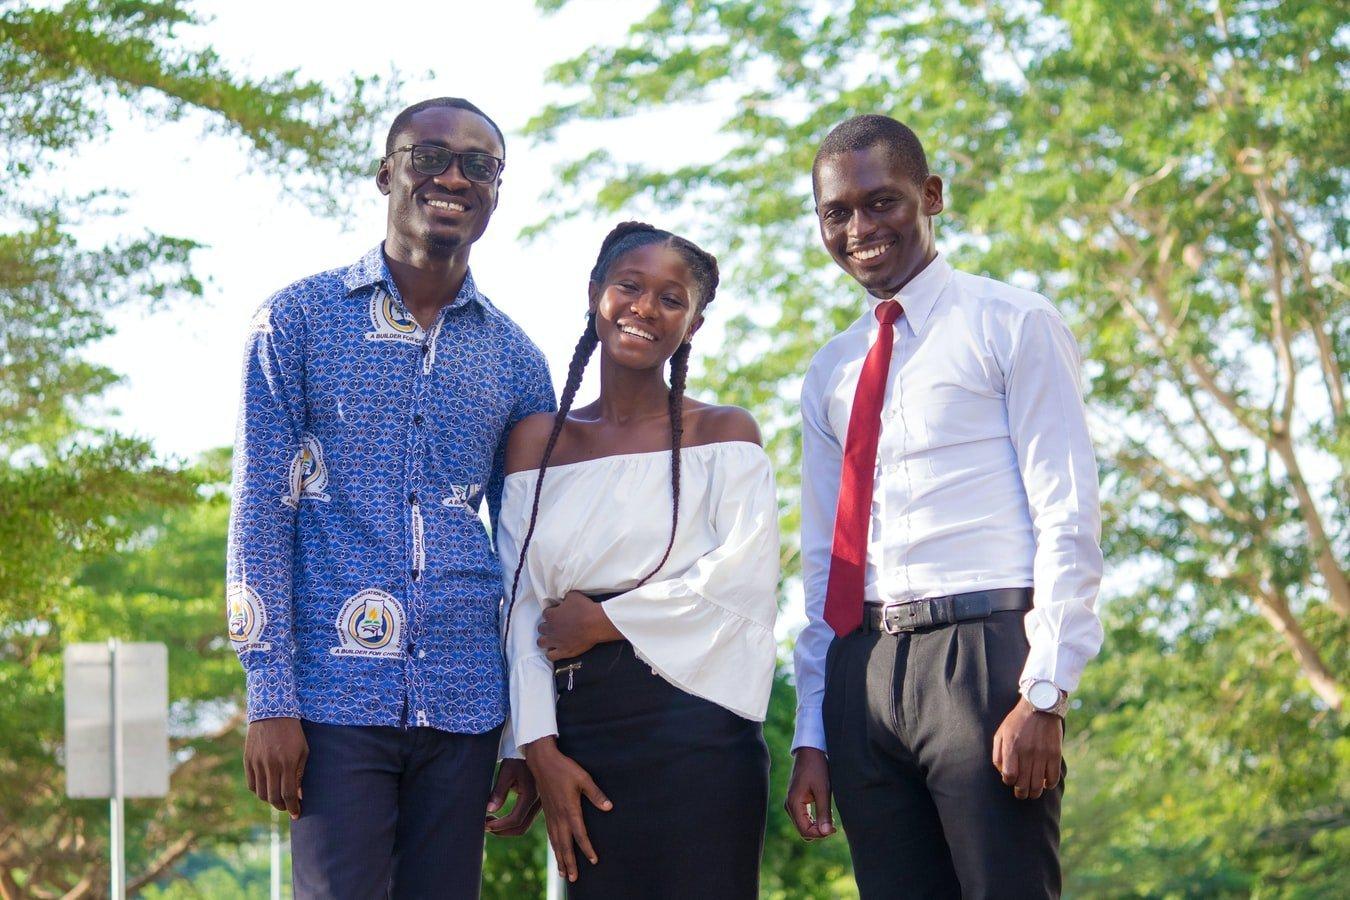 Junge Menschen in Ghana